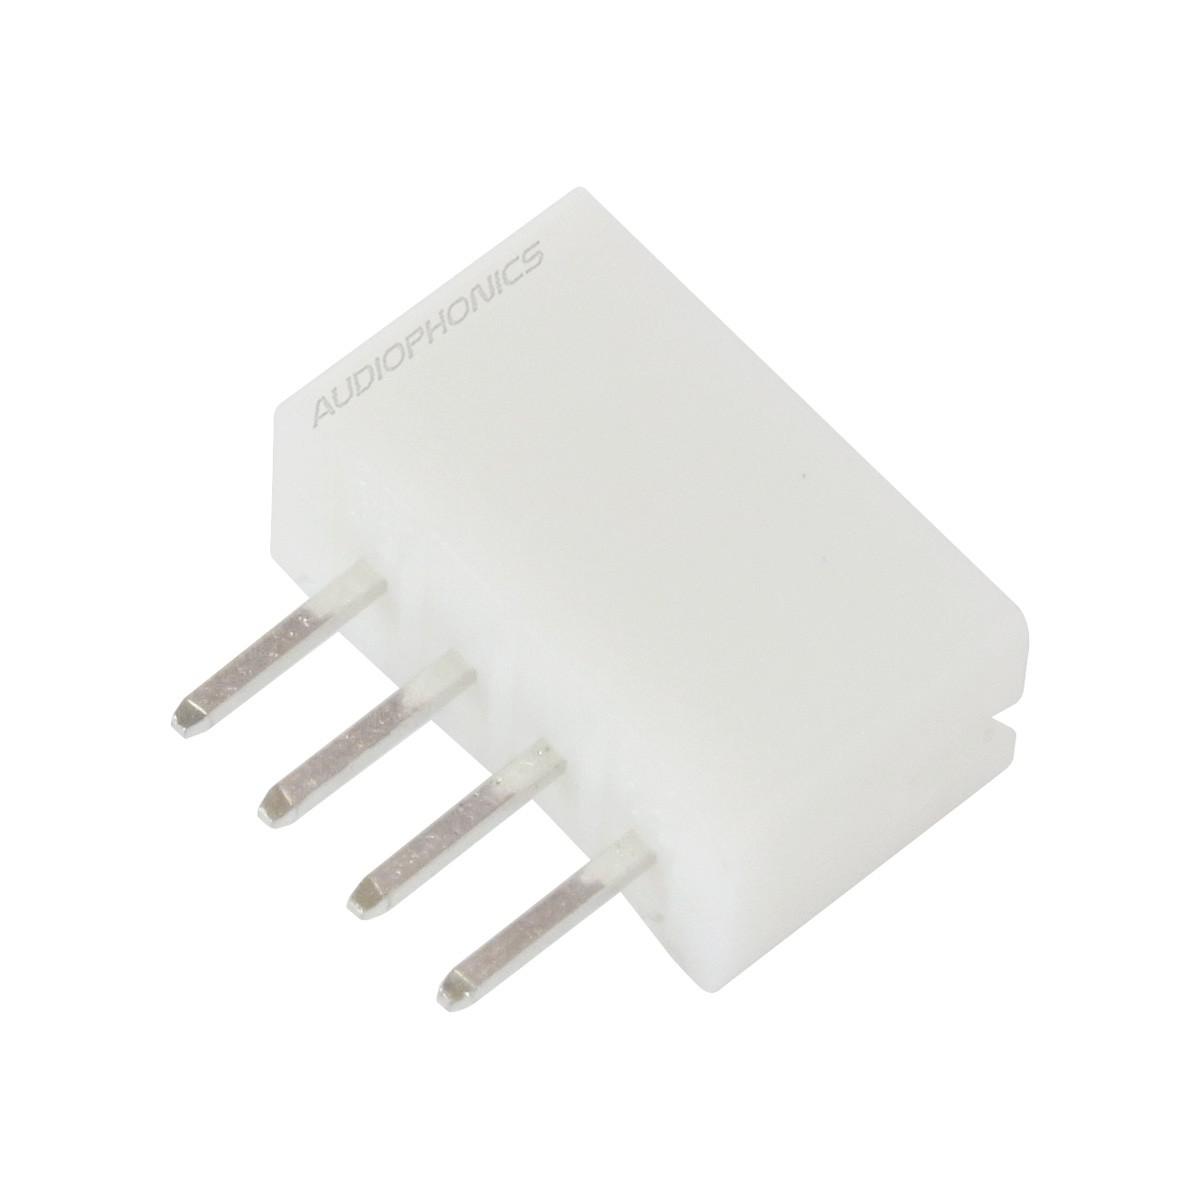 PH 2.0mm Male Socket 4 Channels White (Unit)